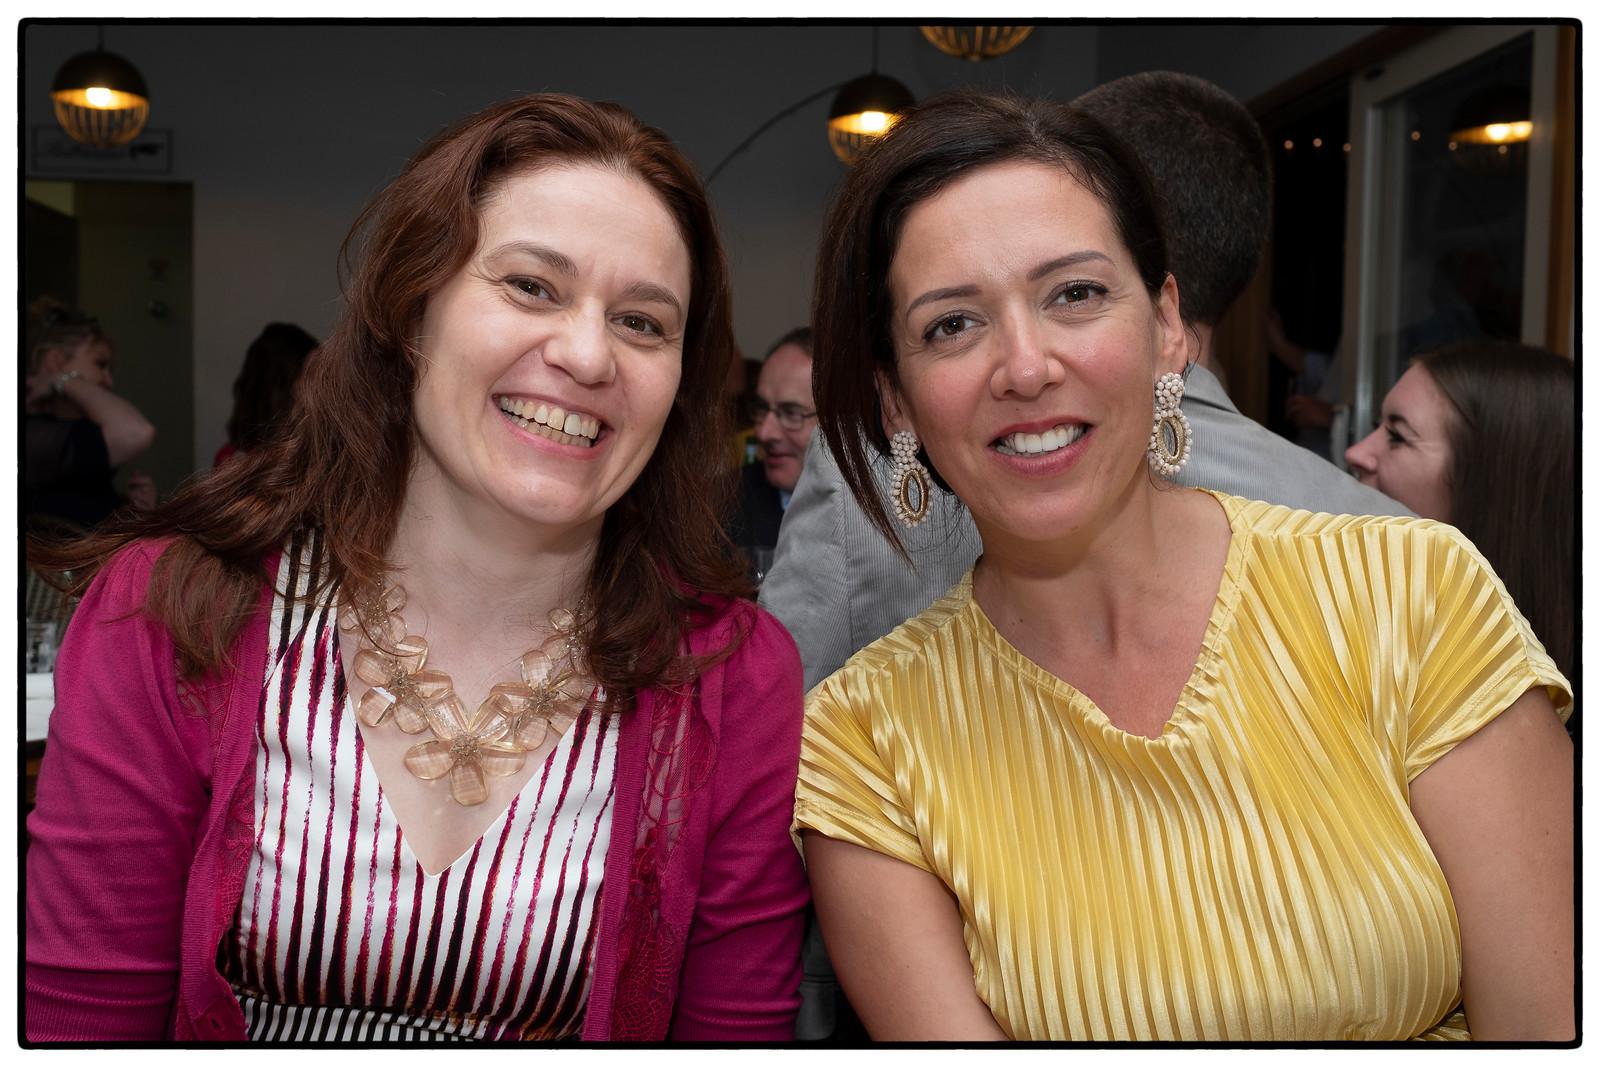 Ruth and Krystina